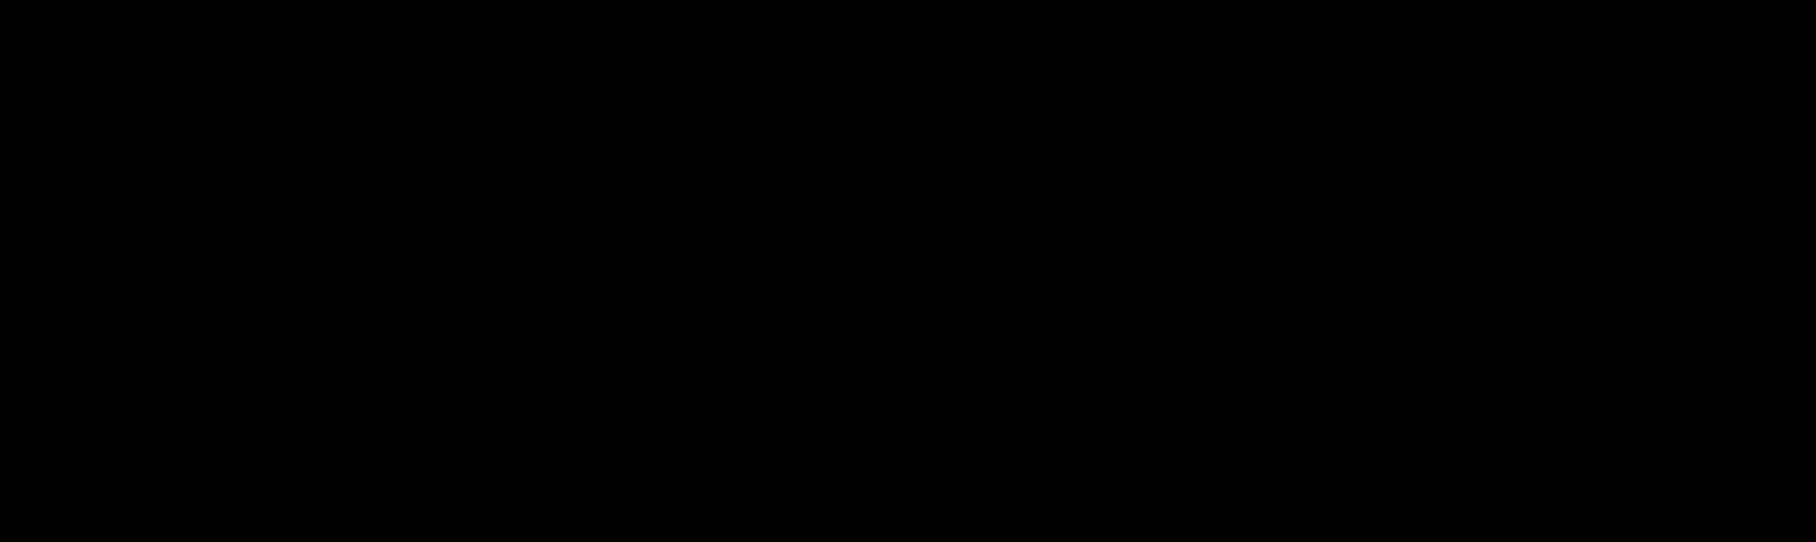 Universities Australia logo